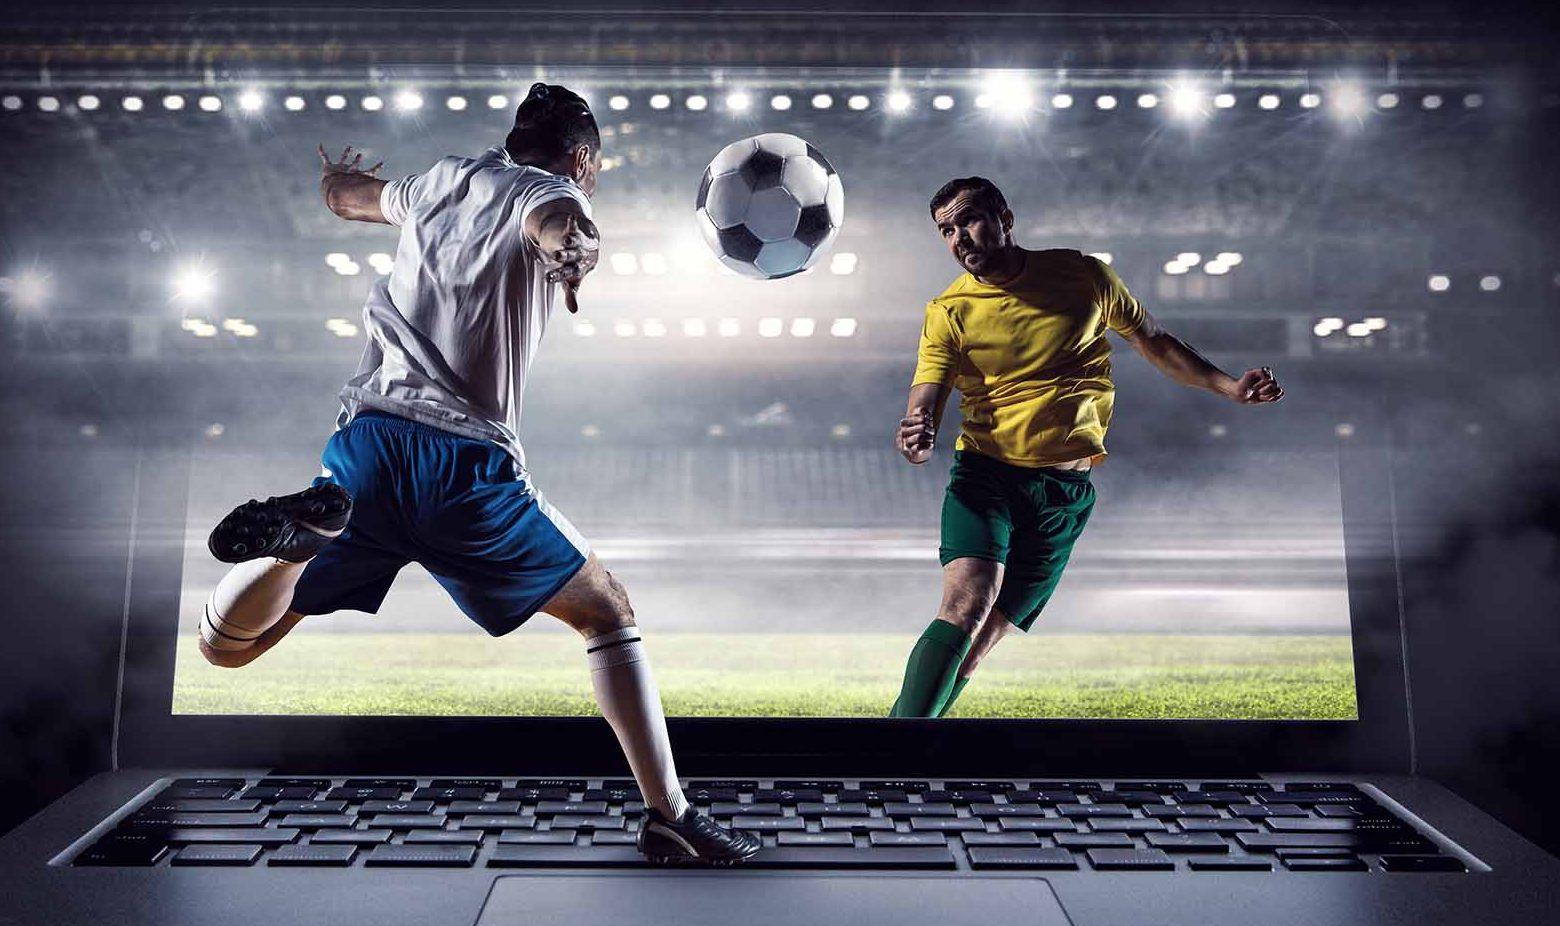 Сделай свои первые ставки на спорт через интернет на ресурсе Stavkitut